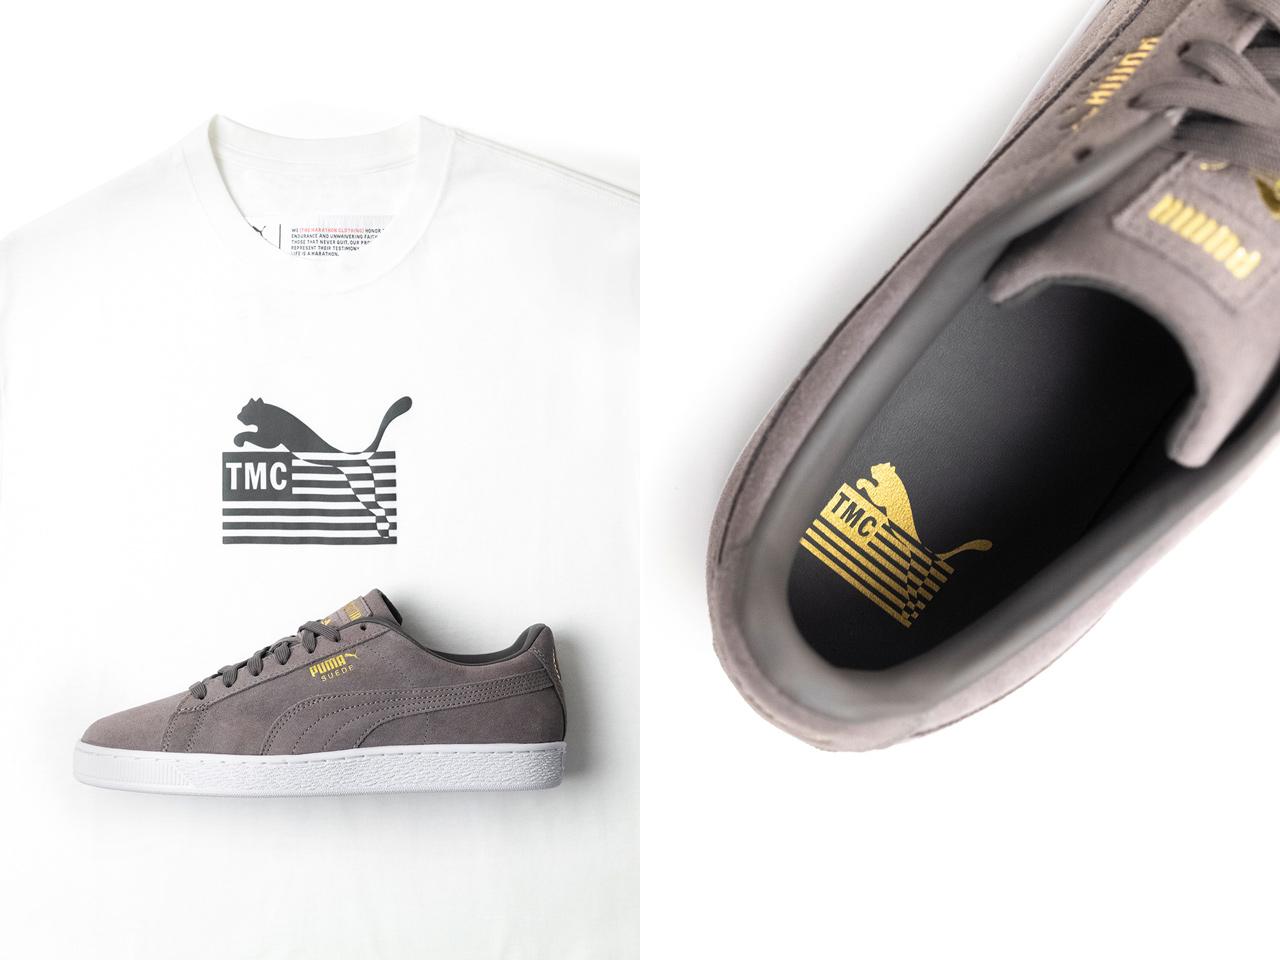 nipsey-hussle-tmc-puma-suede-shoes-shirt